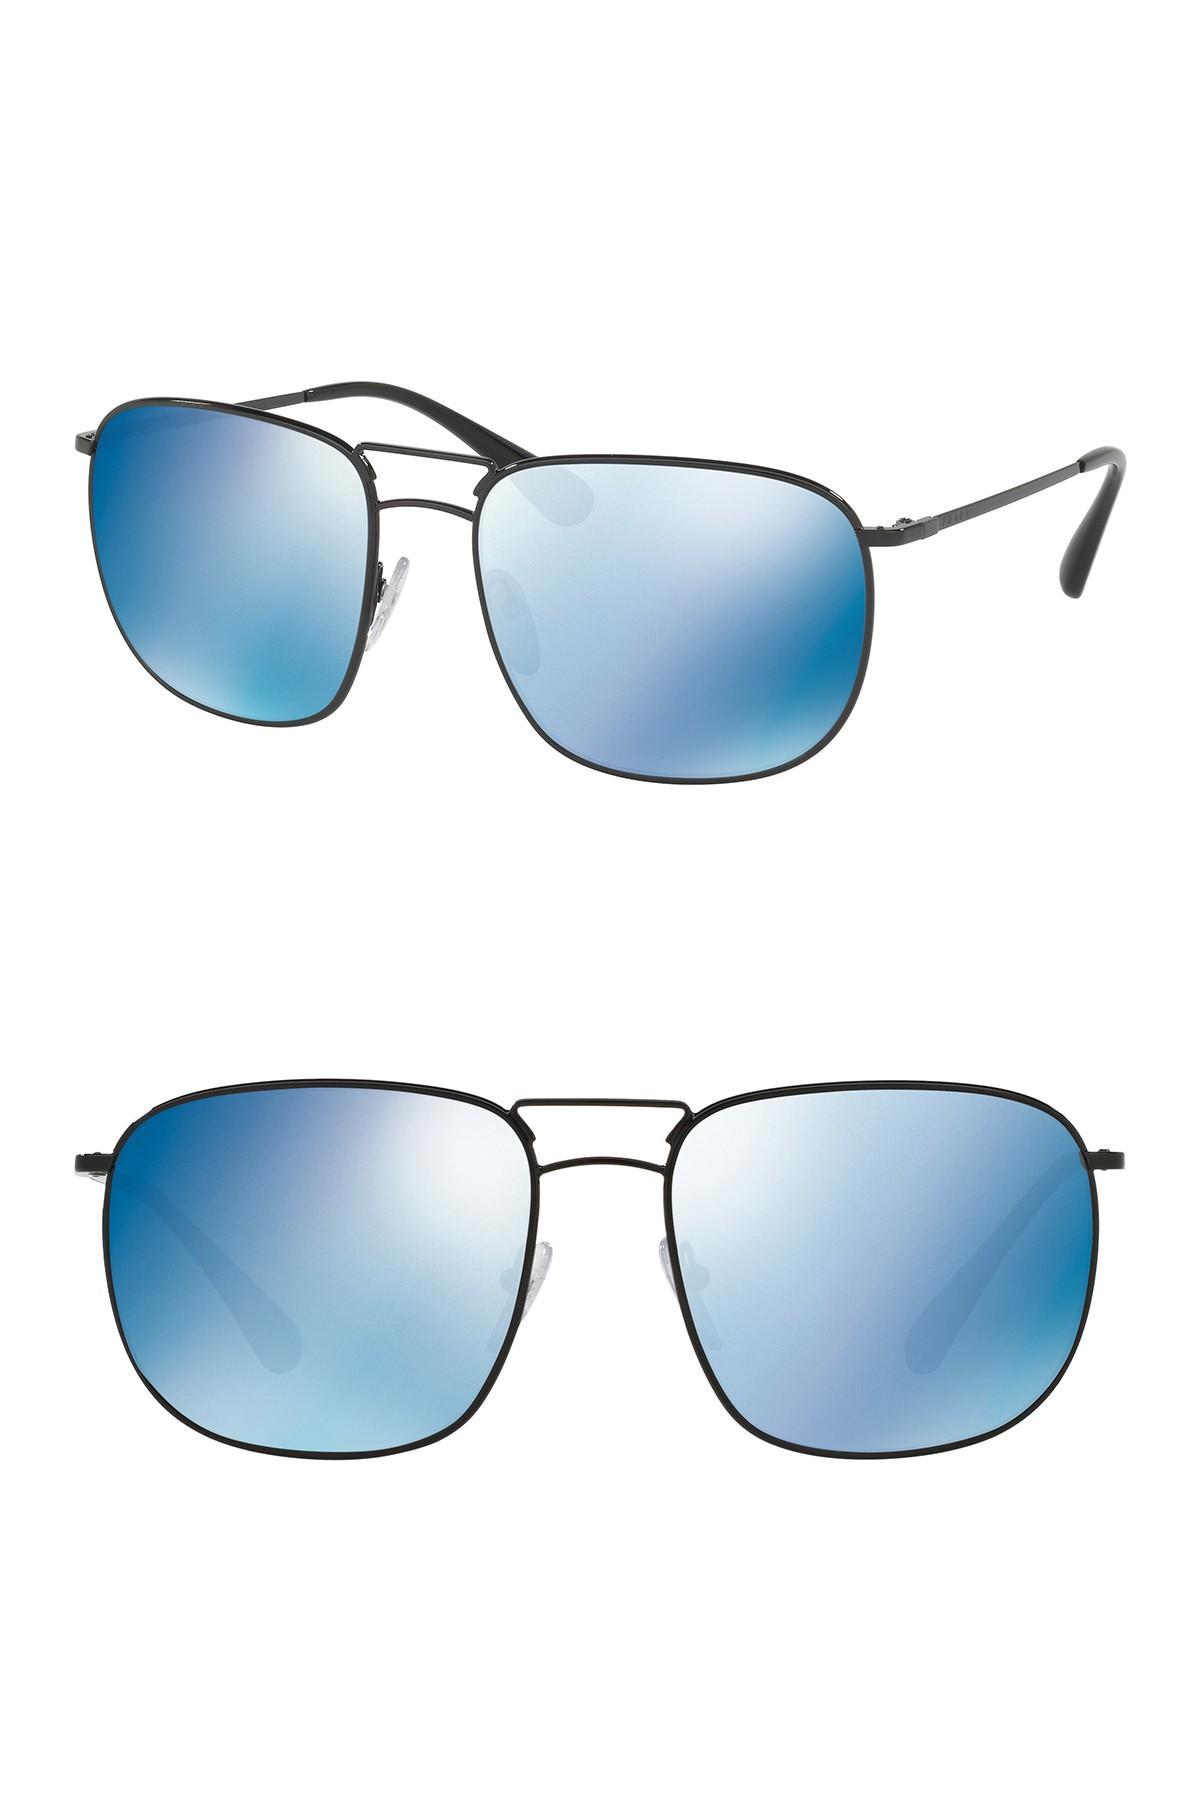 b445f78d9589 Lyst - Prada Pillow Conceptual 60mm Navigator Sunglasses in Black ...